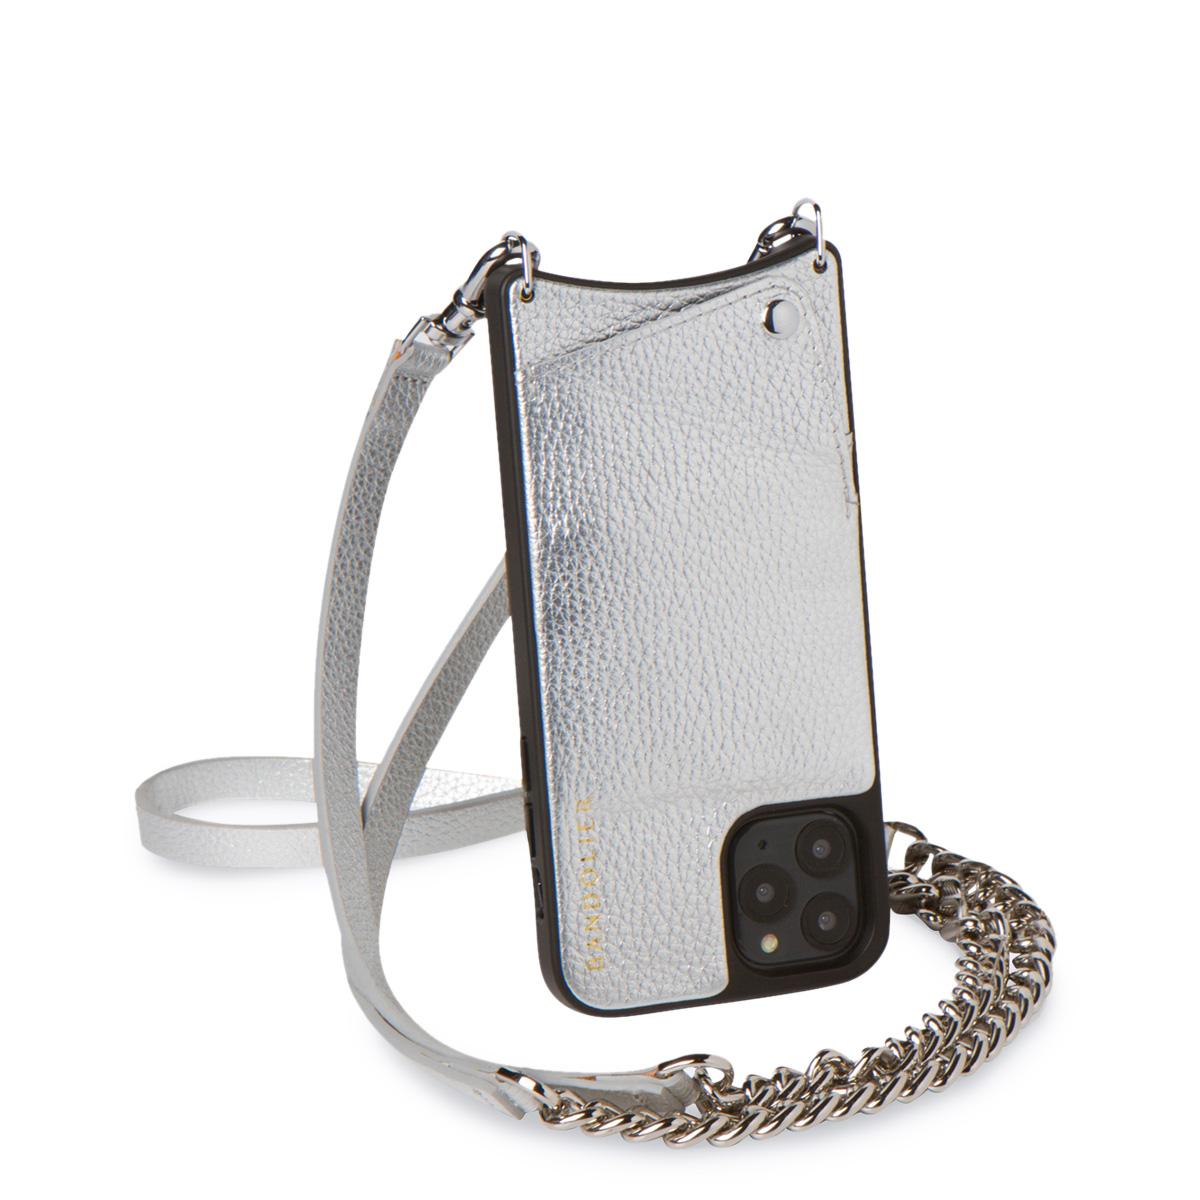 BANDOLIER LEXI RICH SILVER バンドリヤー iPhone11 Pro MAX ケース スマホ 携帯 ショルダー アイフォン レクシー メンズ レディース シルバー 10LEX [5/27 新入荷]